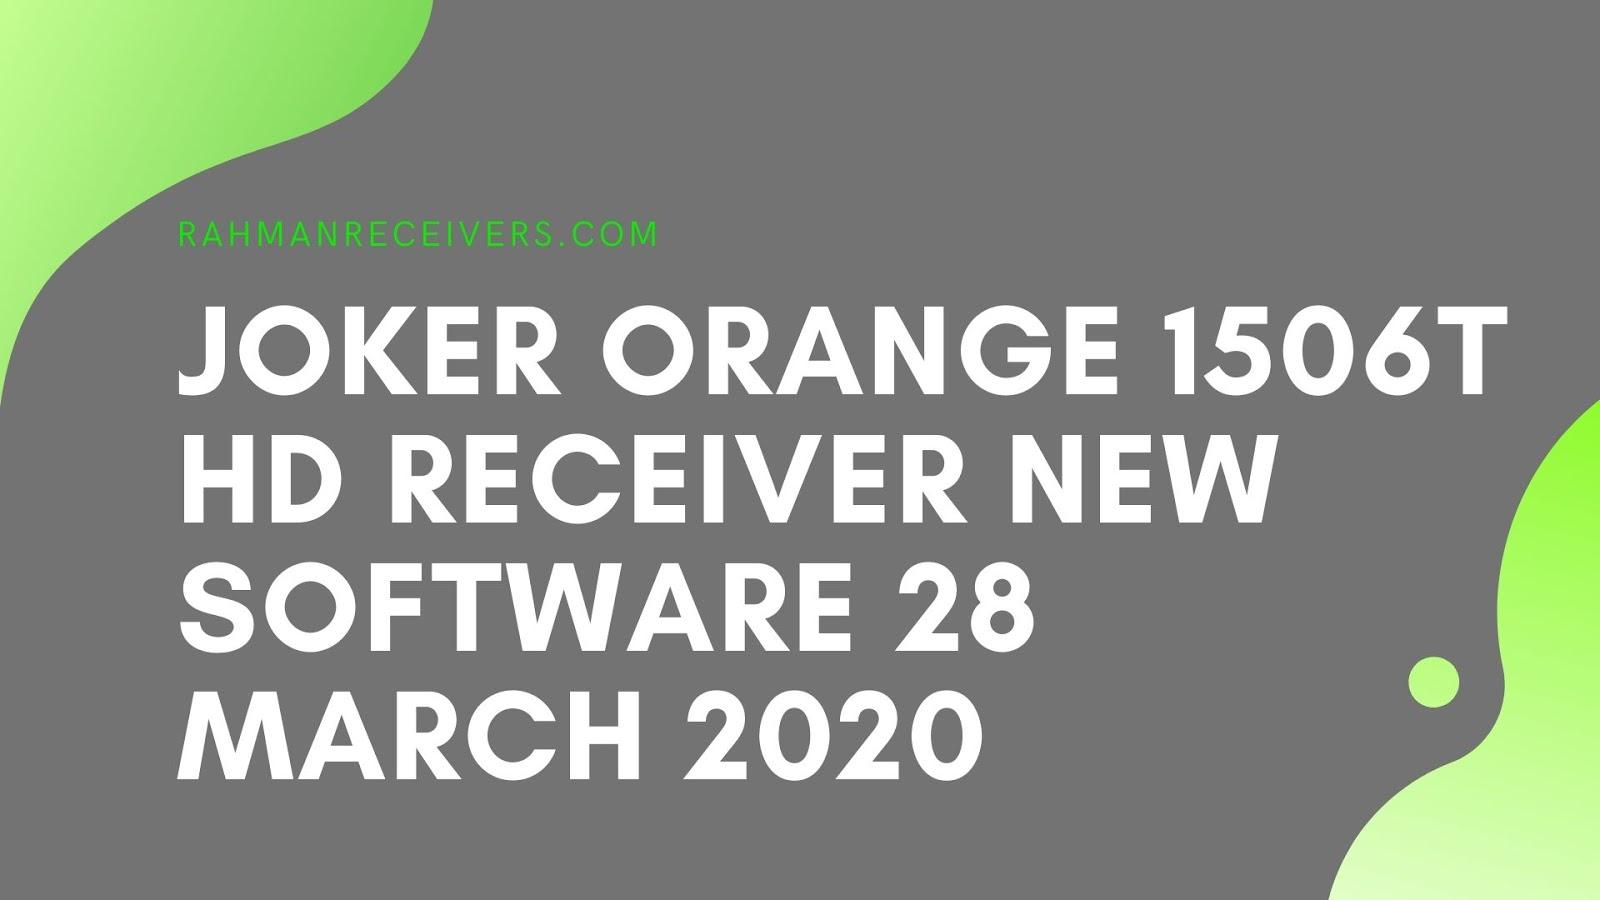 JOKER ORANGE 1506T HD RECEIVER NEW SOFTWARE 28 MARCH 2020